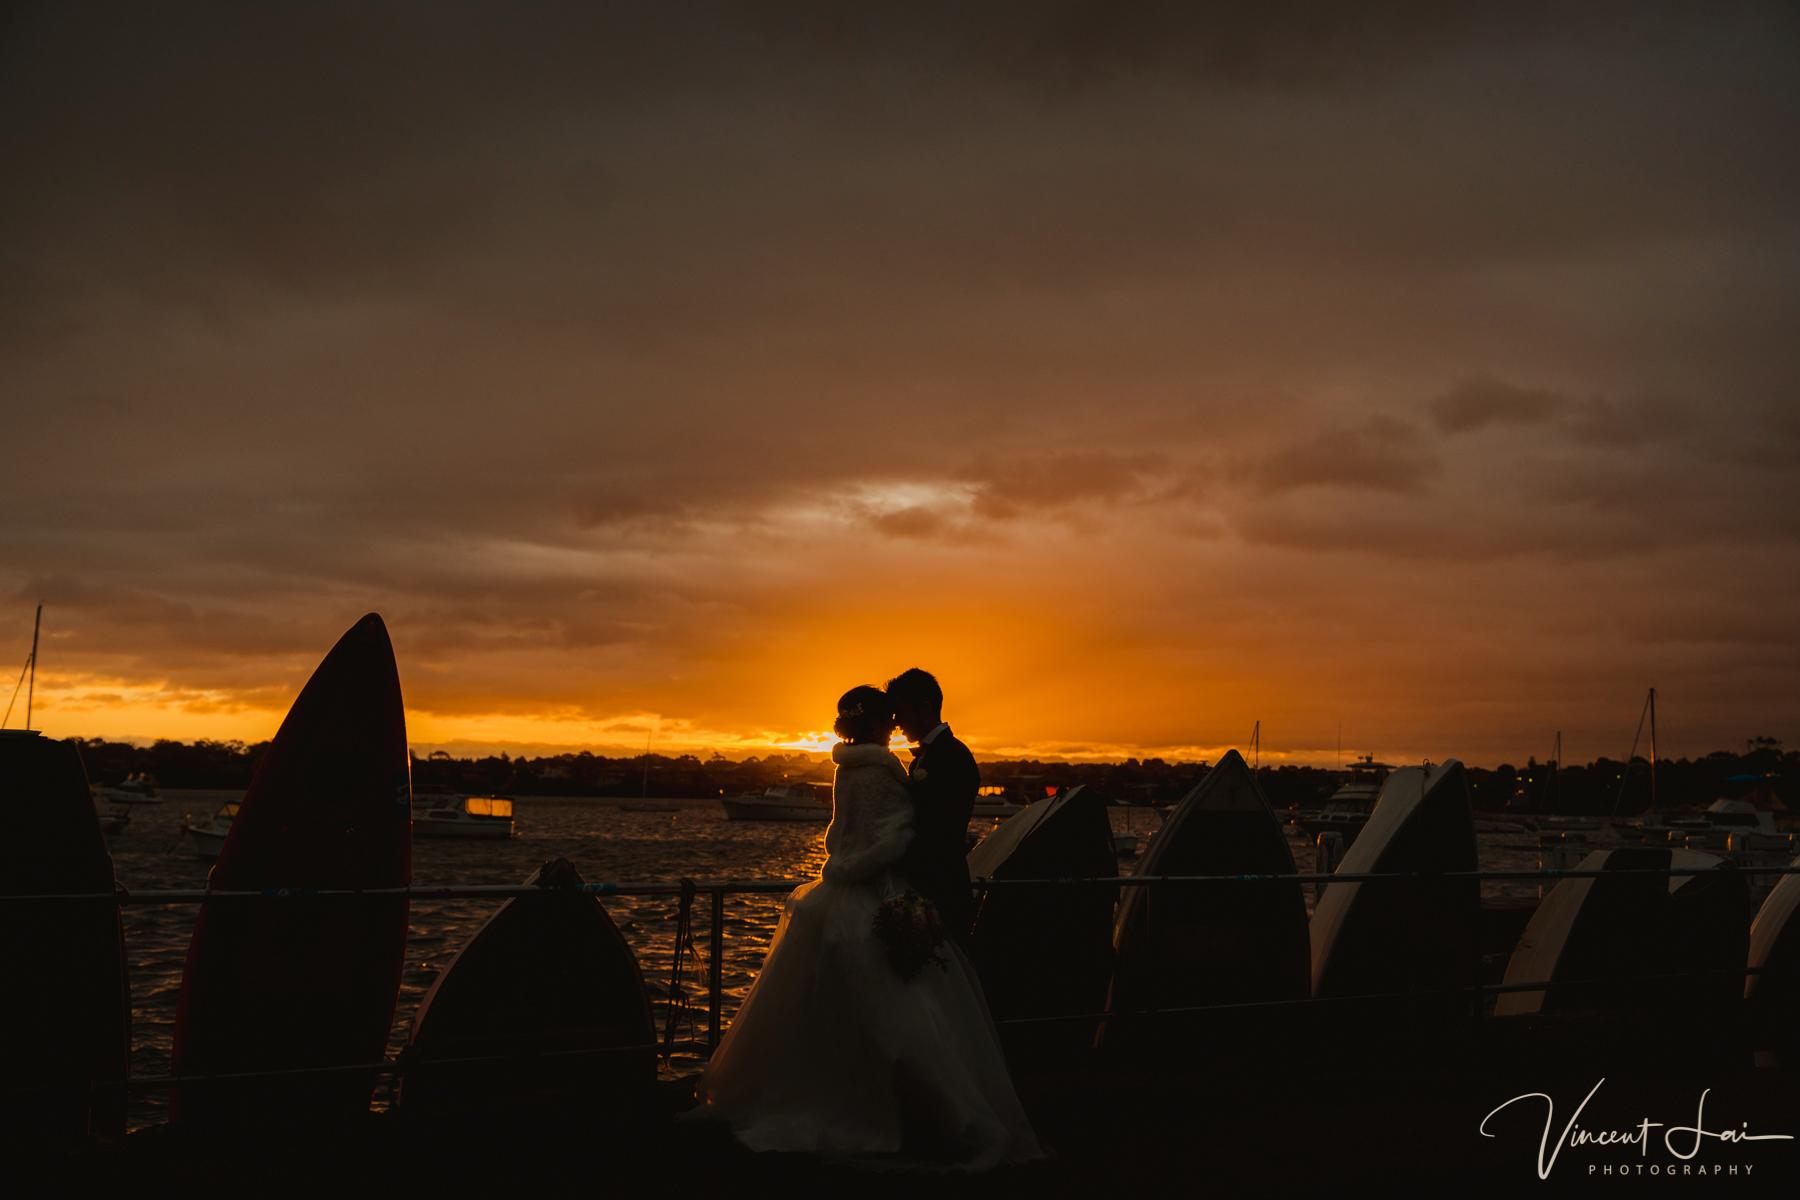 Montage Navarra Wedding overlooking Iron Cove Bay